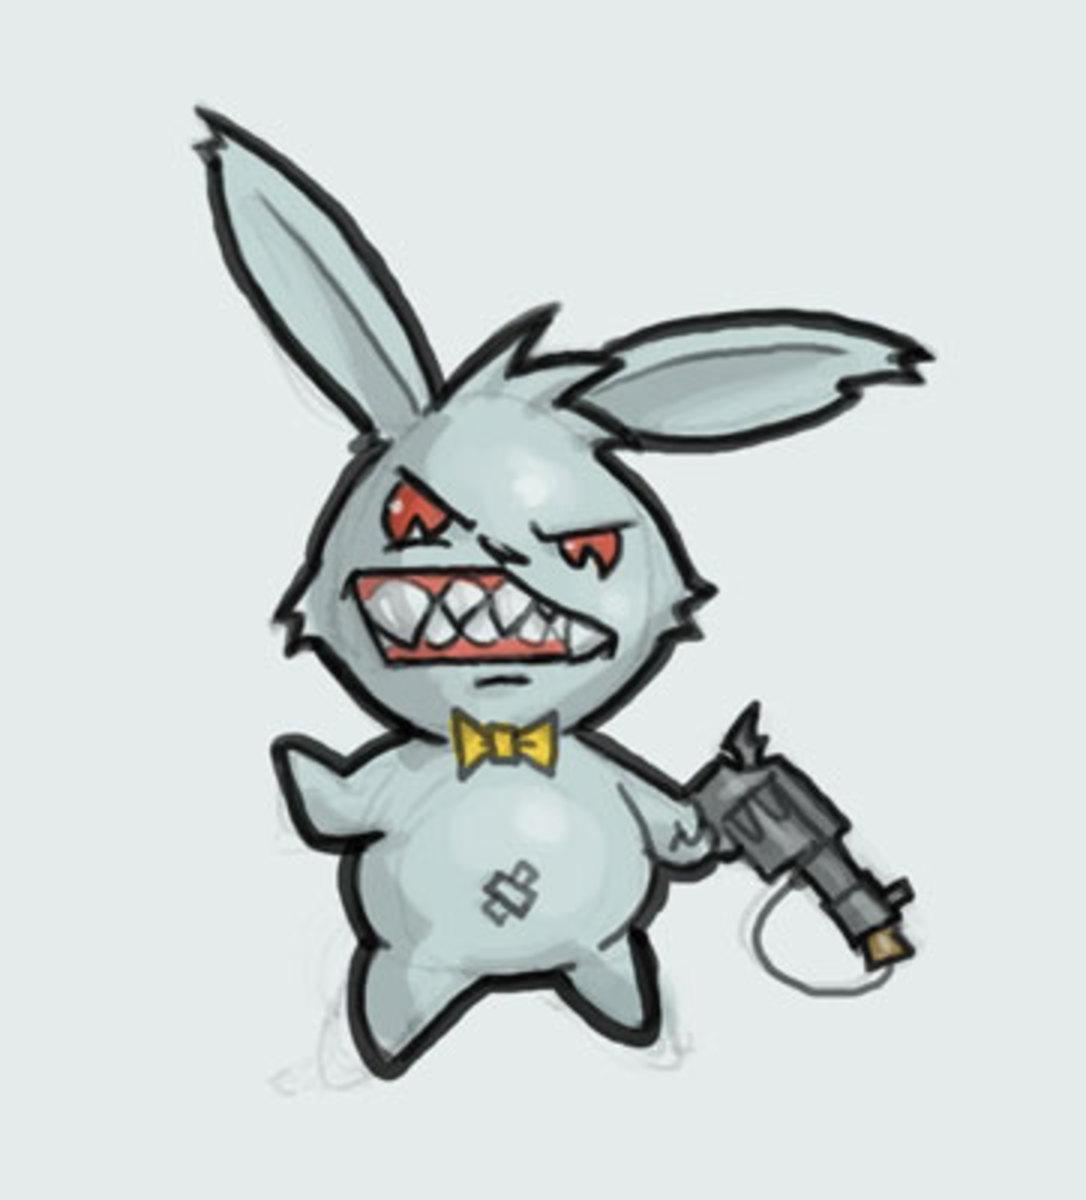 Image from Idrawgirls.blogspot.com